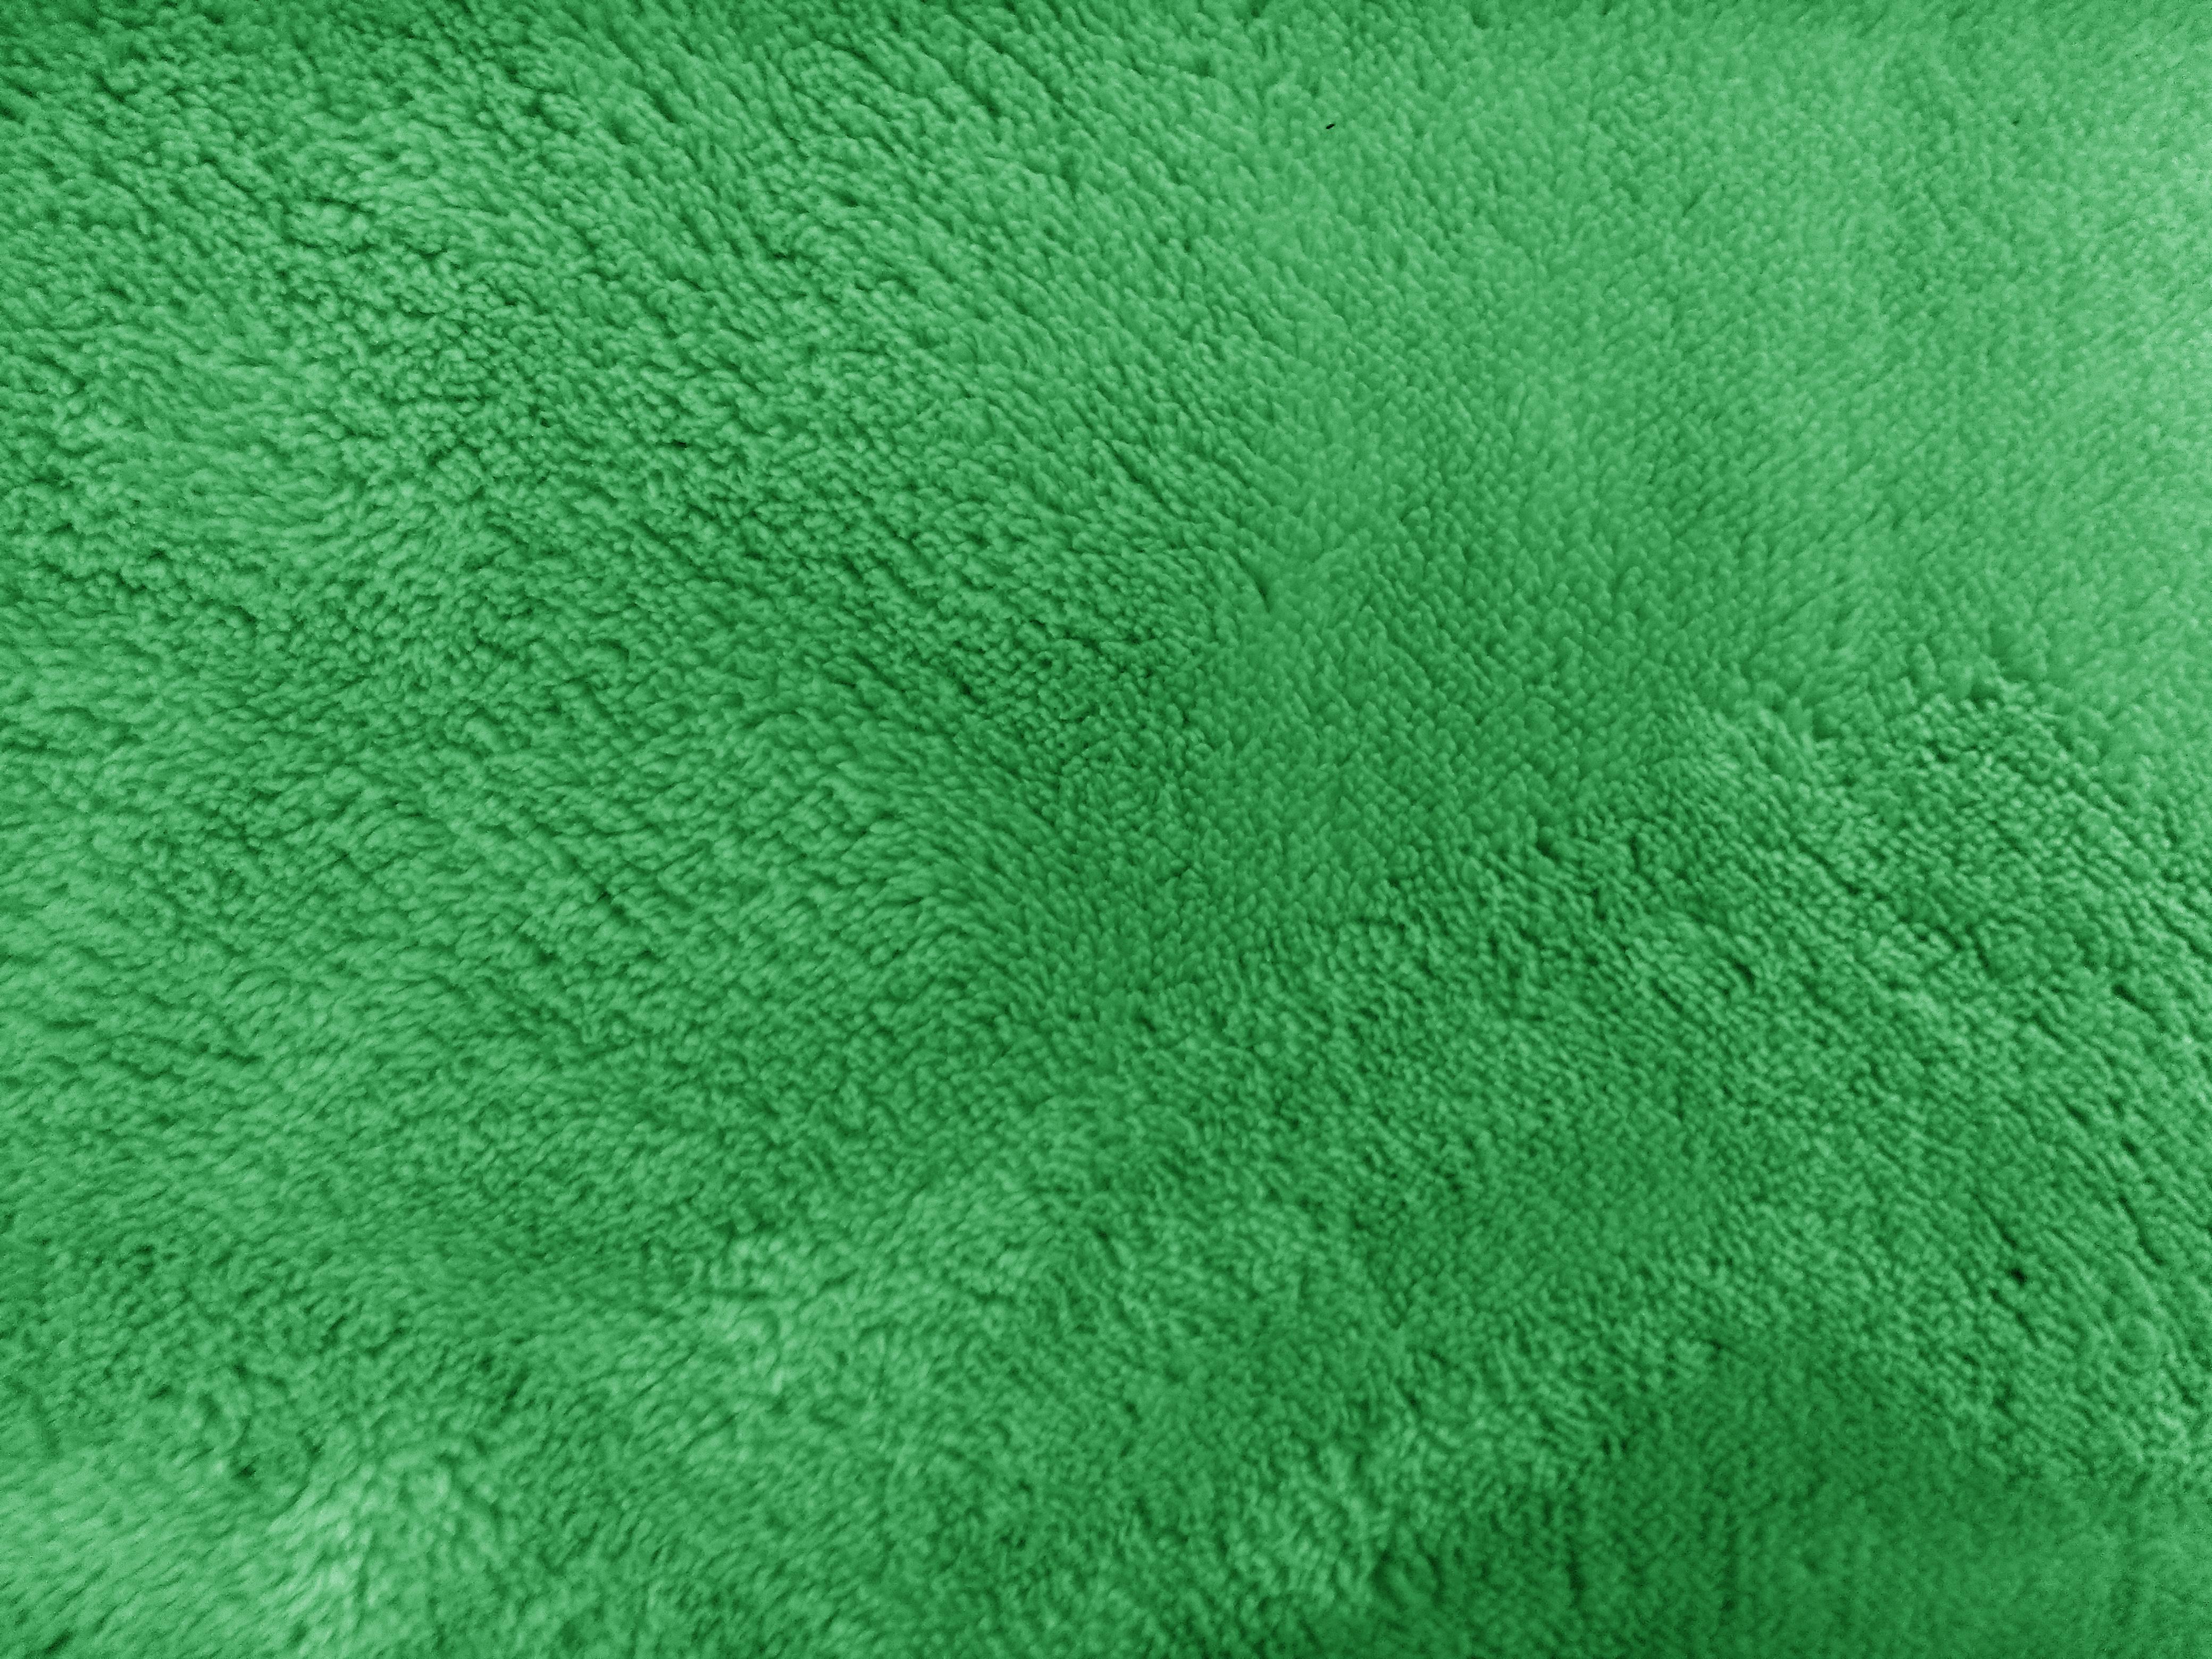 Plush Green Bathmat Texture Picture Free Photograph